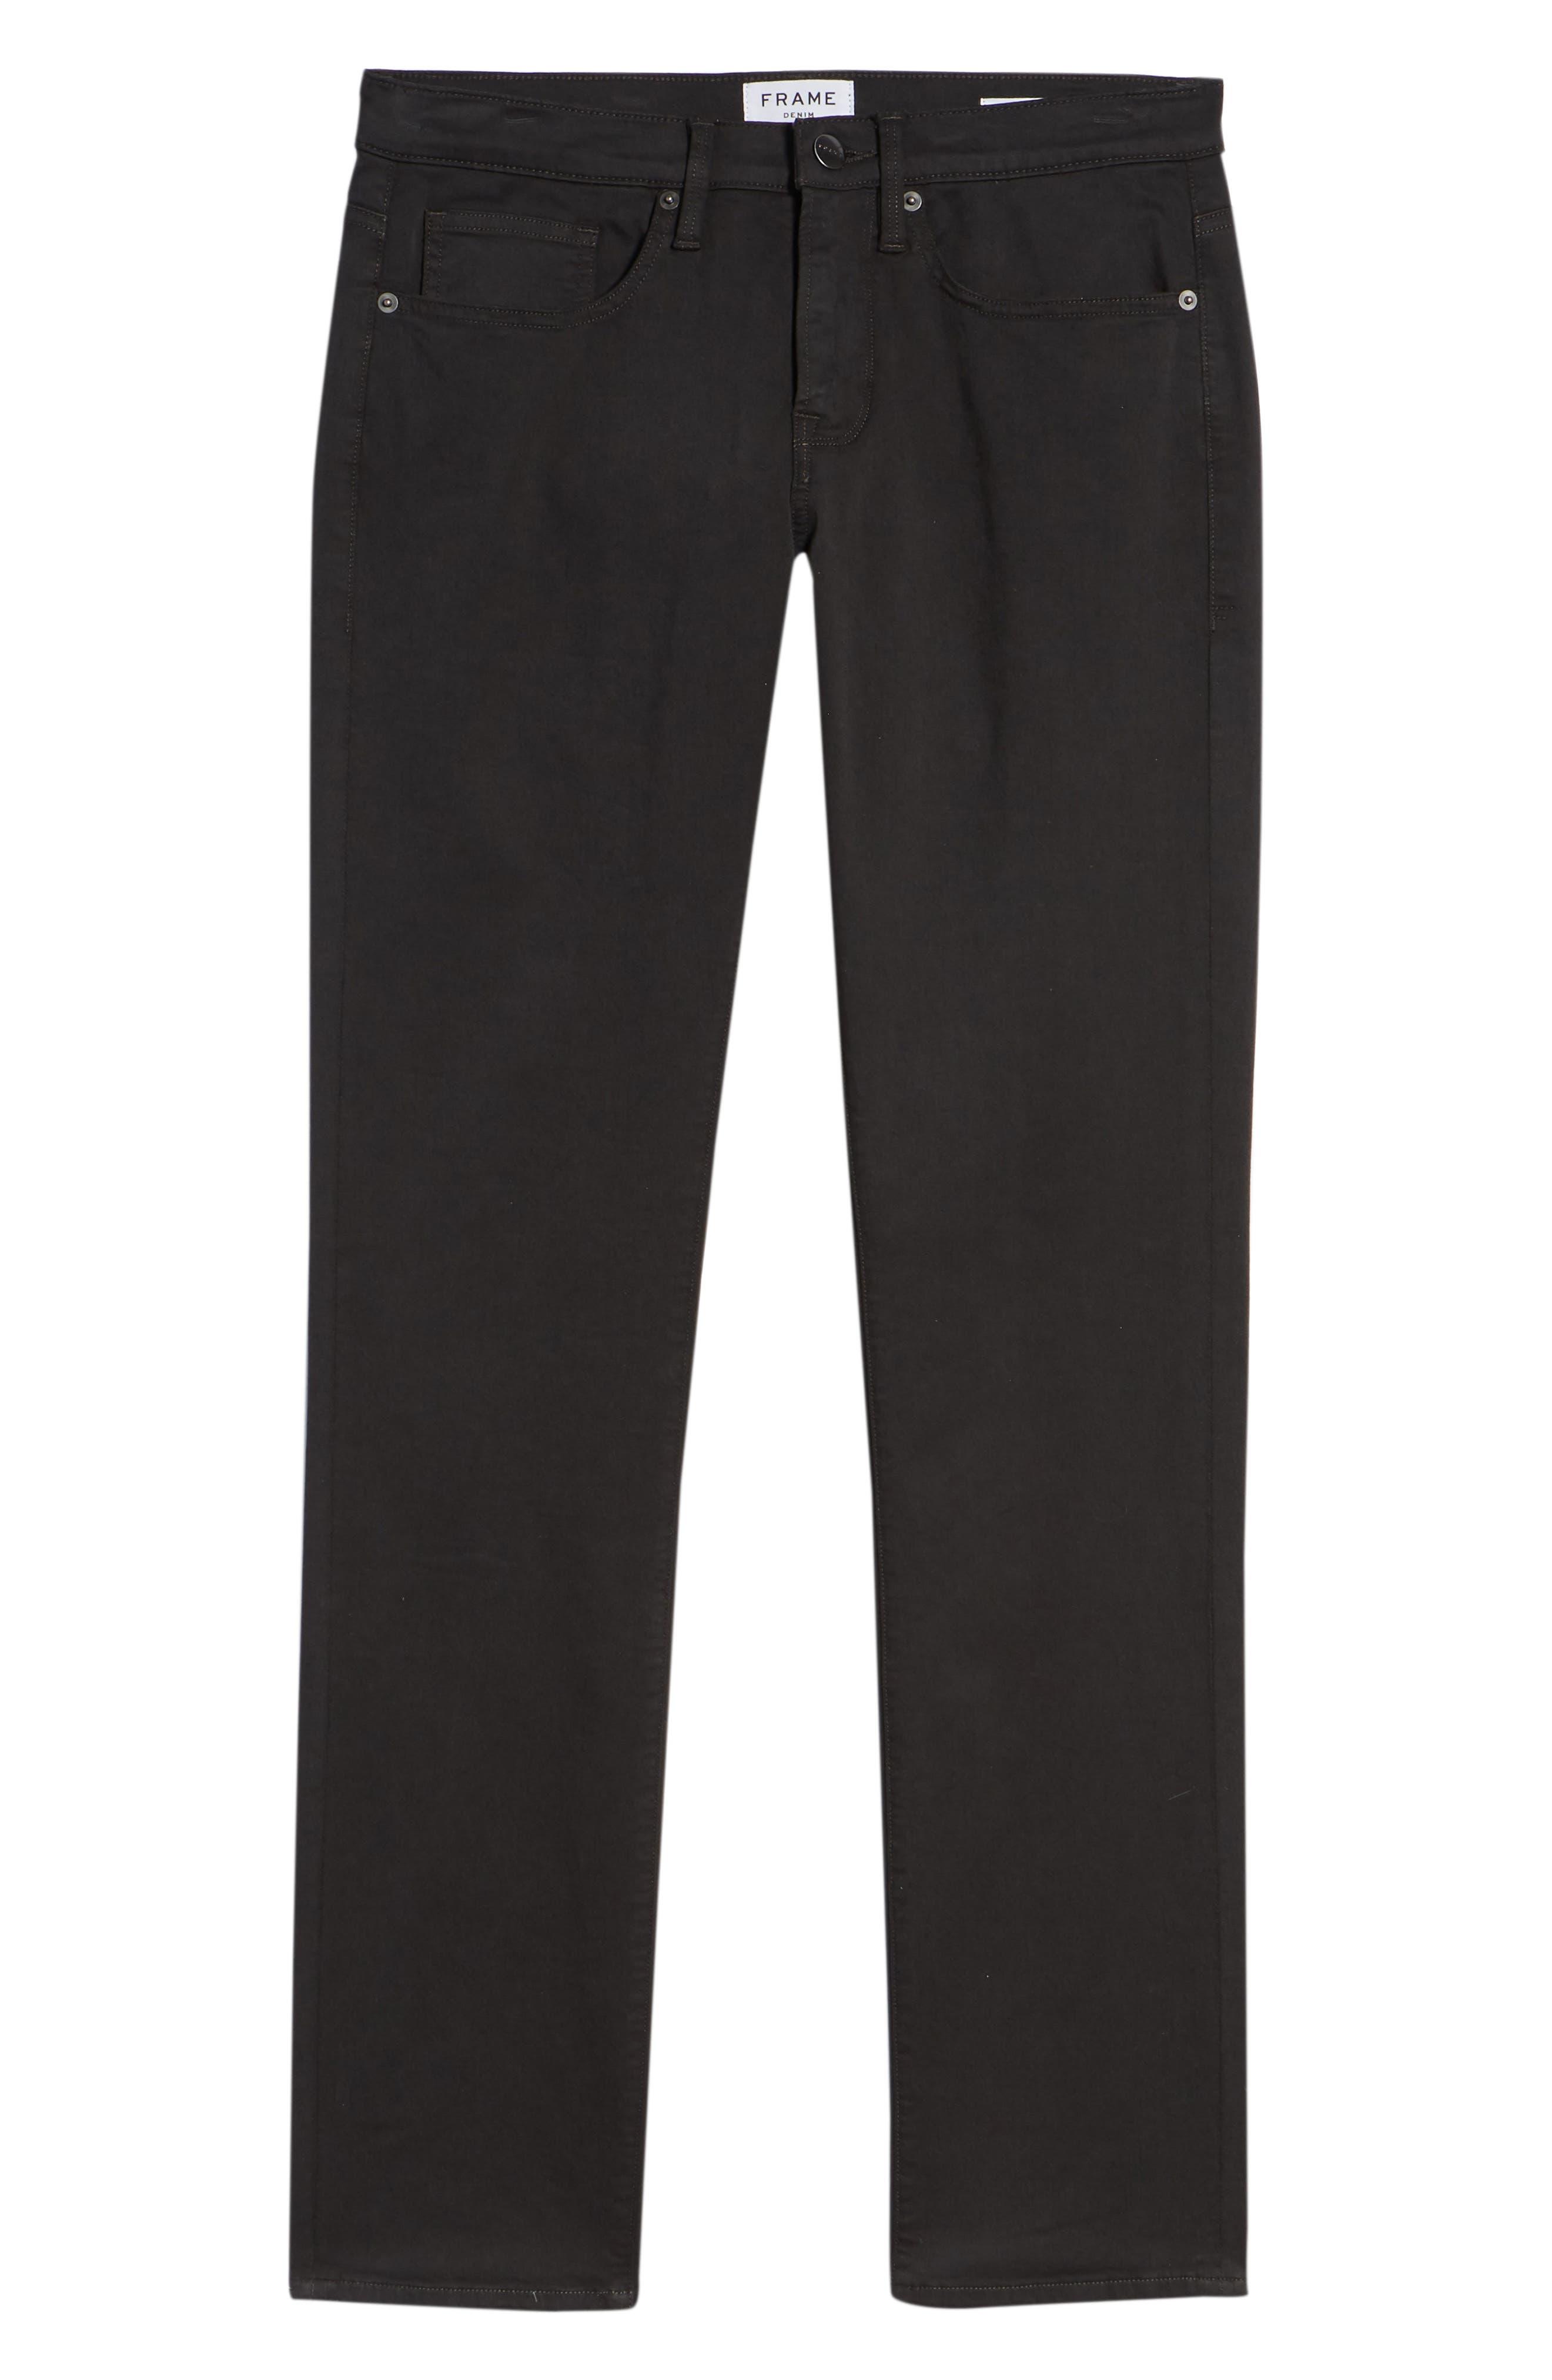 L'Homme Slim Fit Chino Pants,                             Alternate thumbnail 6, color,                             HEMATITE